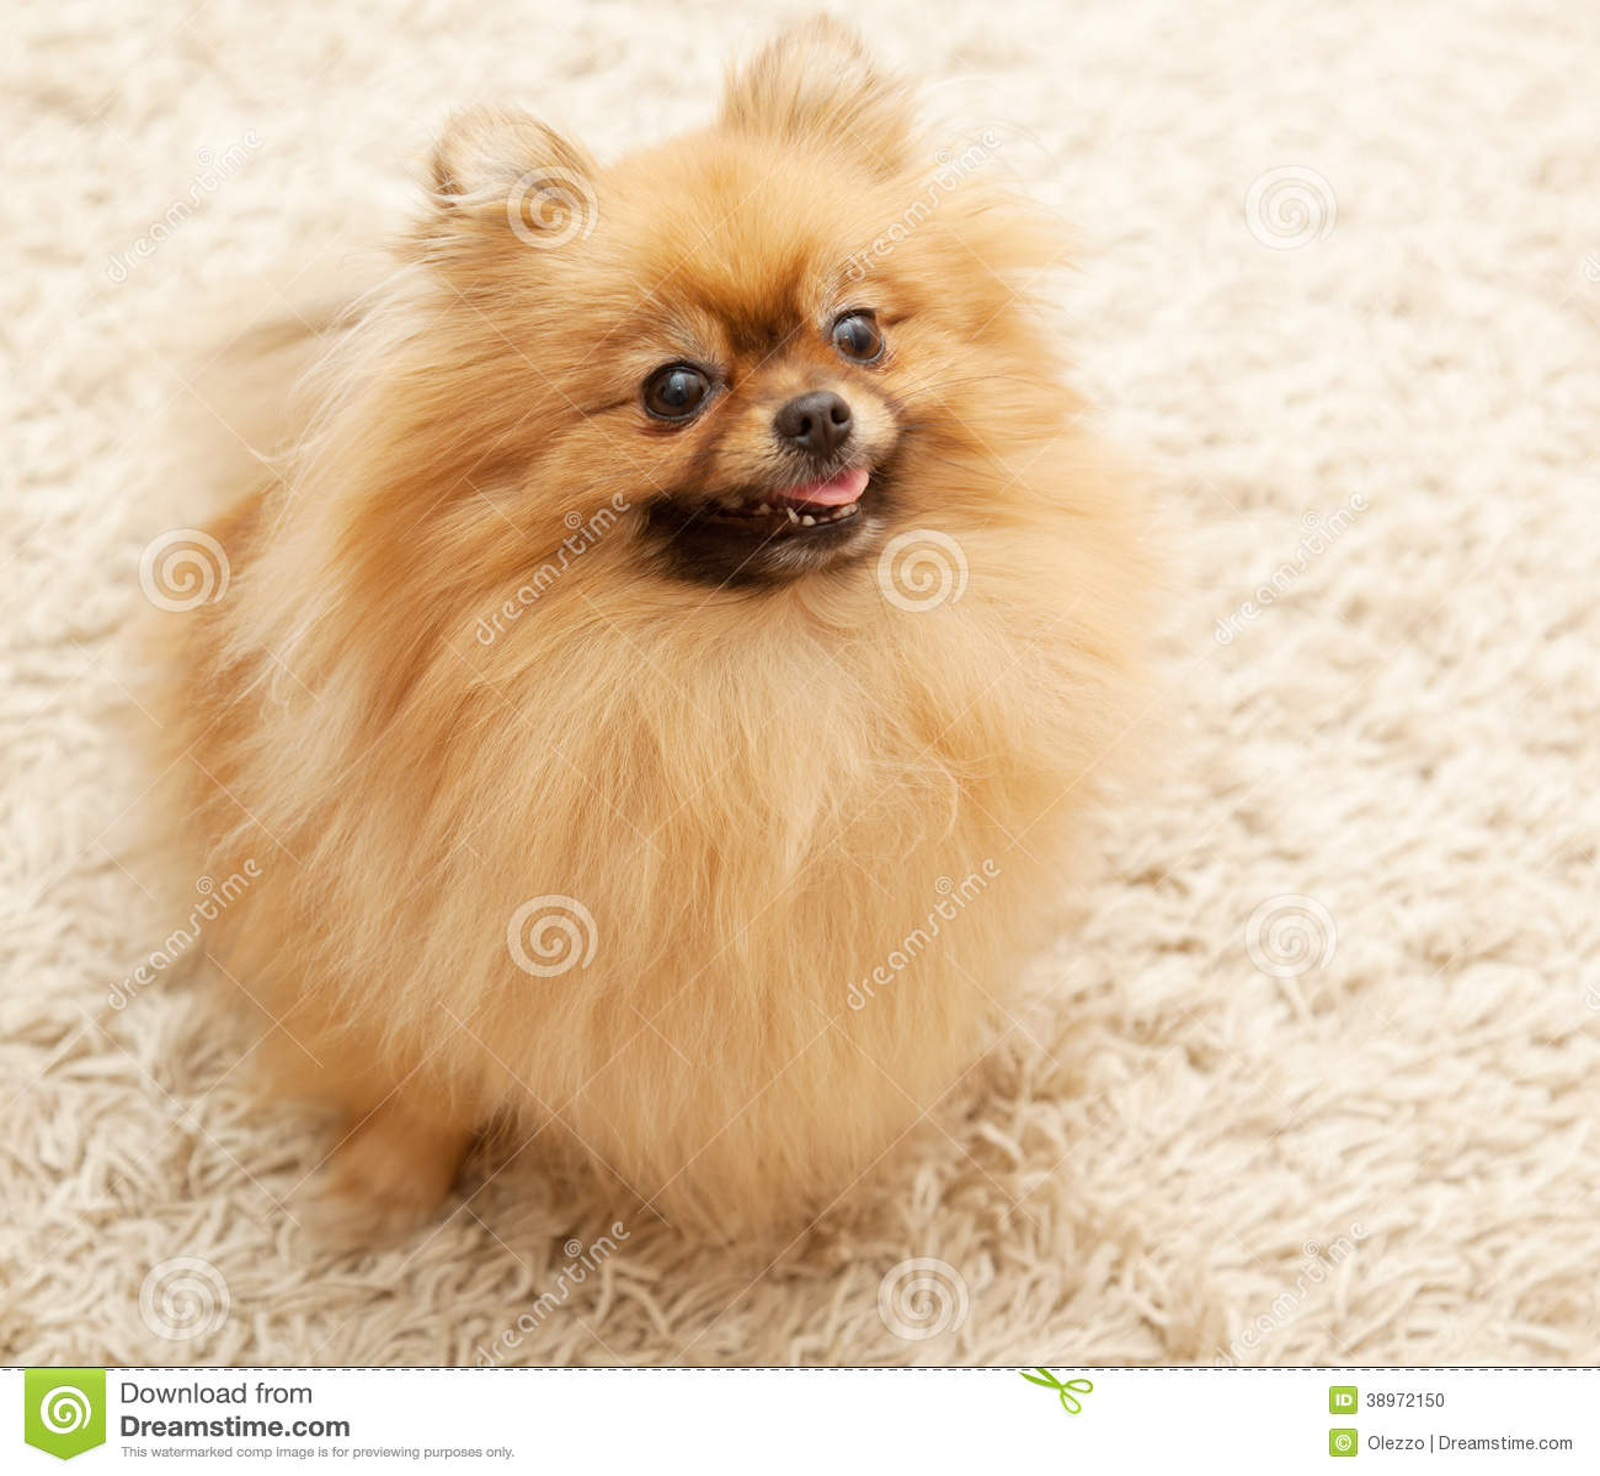 Pomeranian Sitting On Carpet Stock Photo Image 38972150